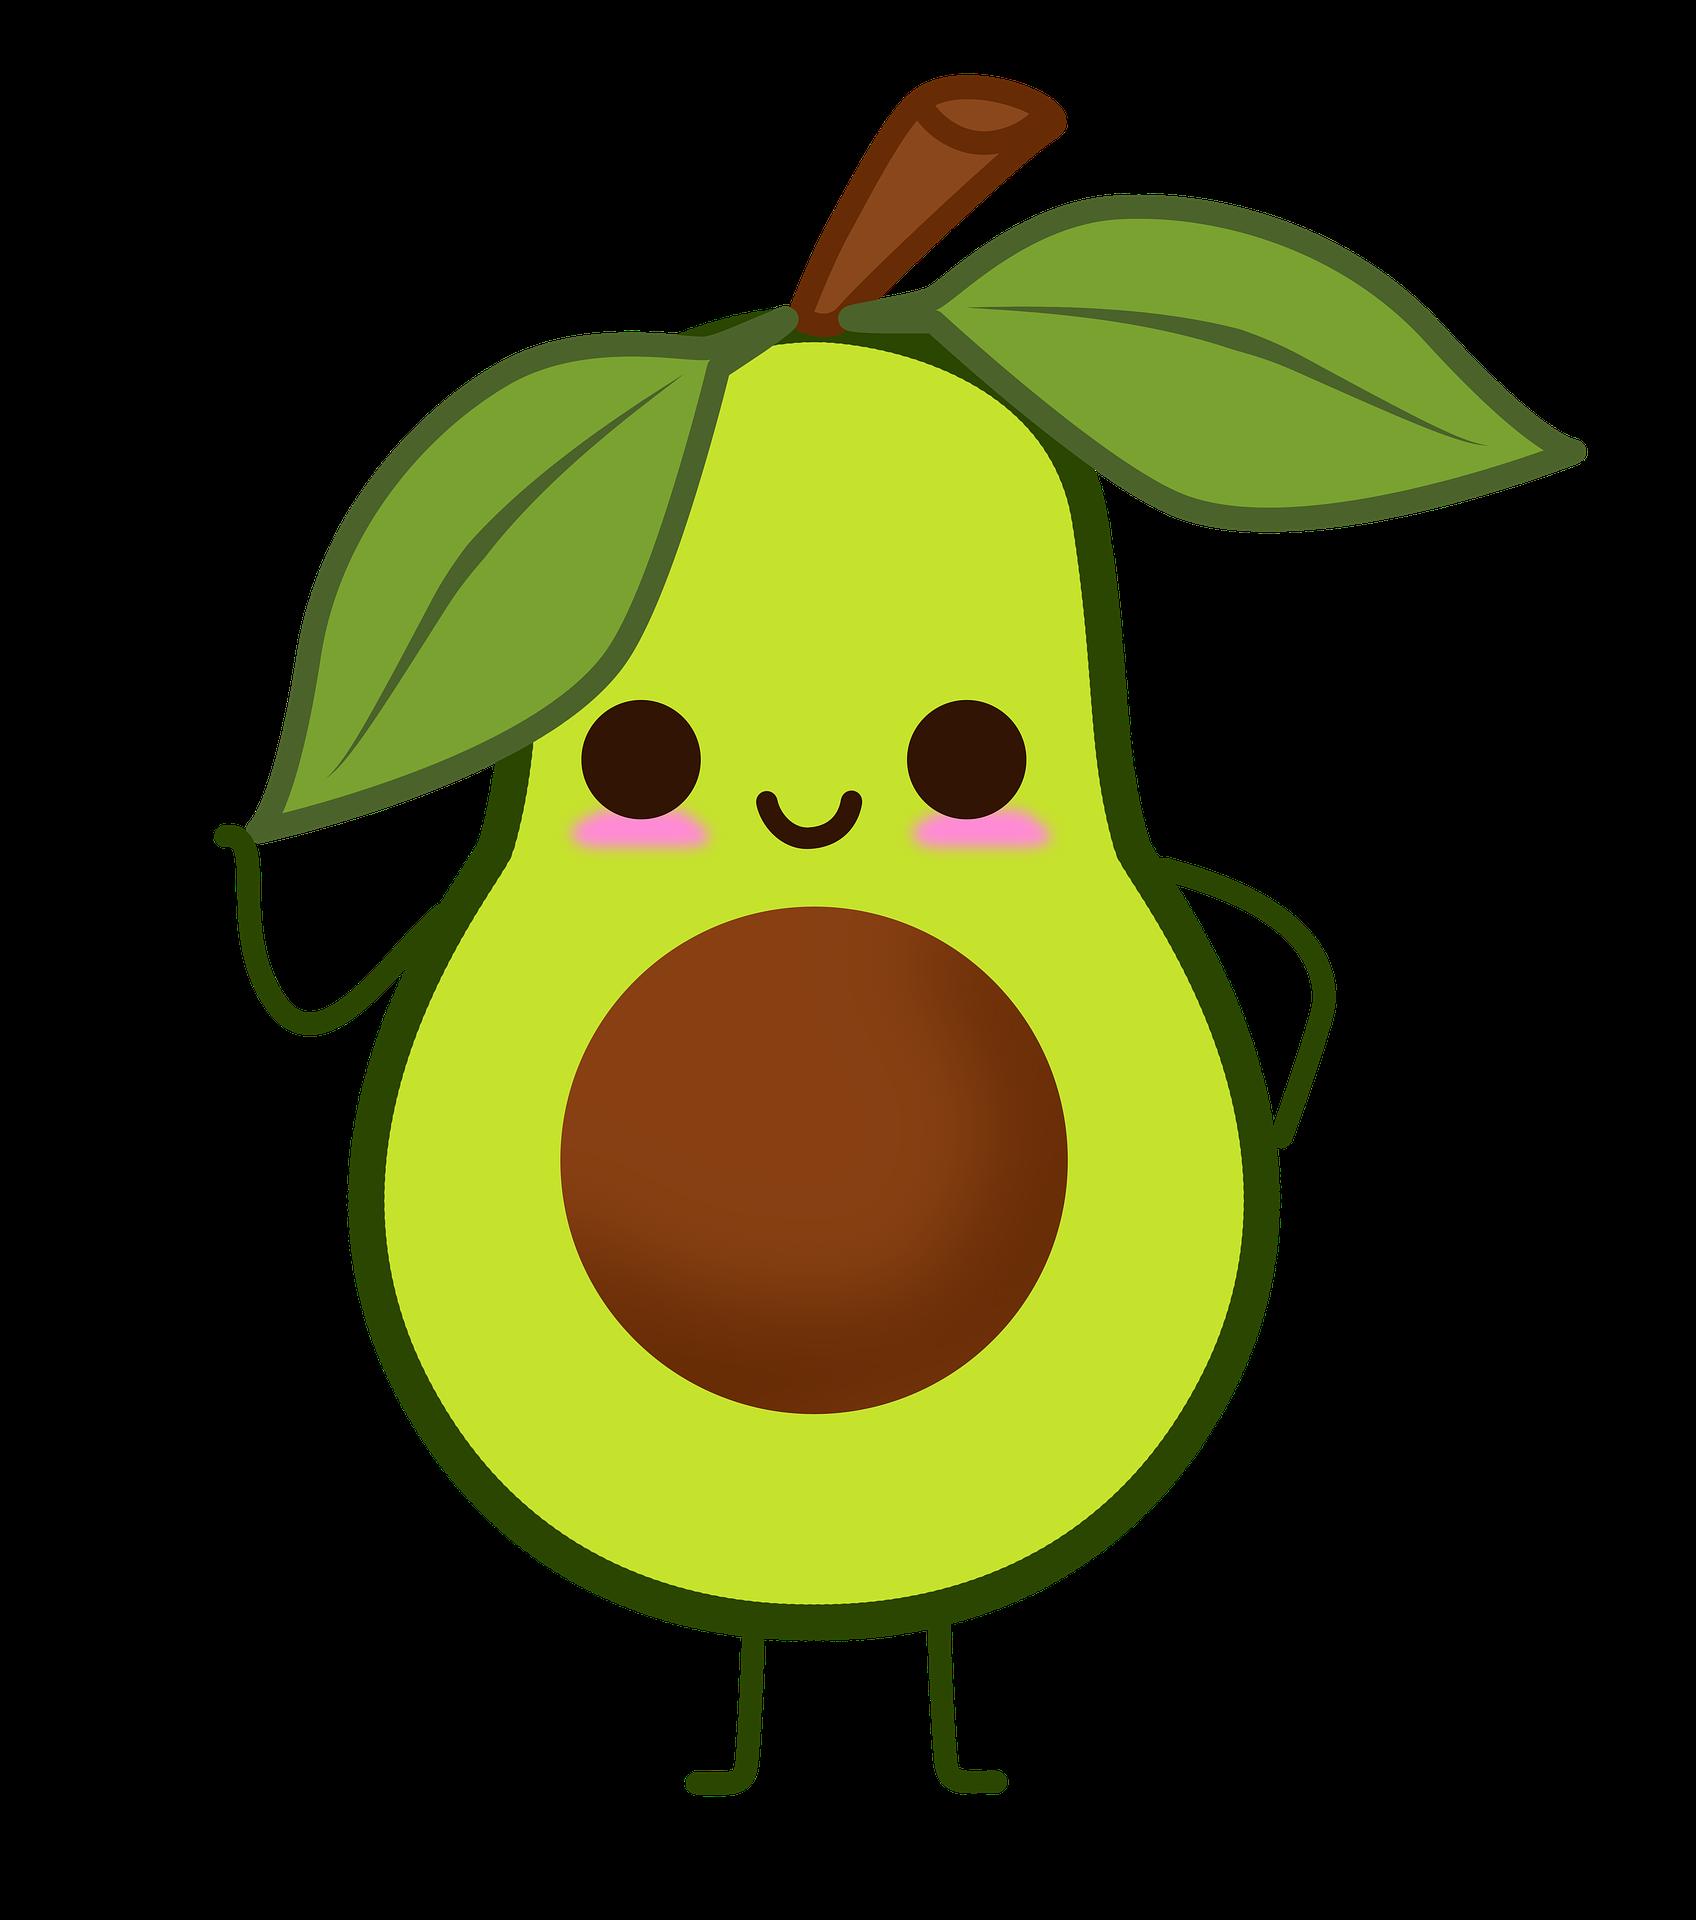 Avocado cartoon clipart.